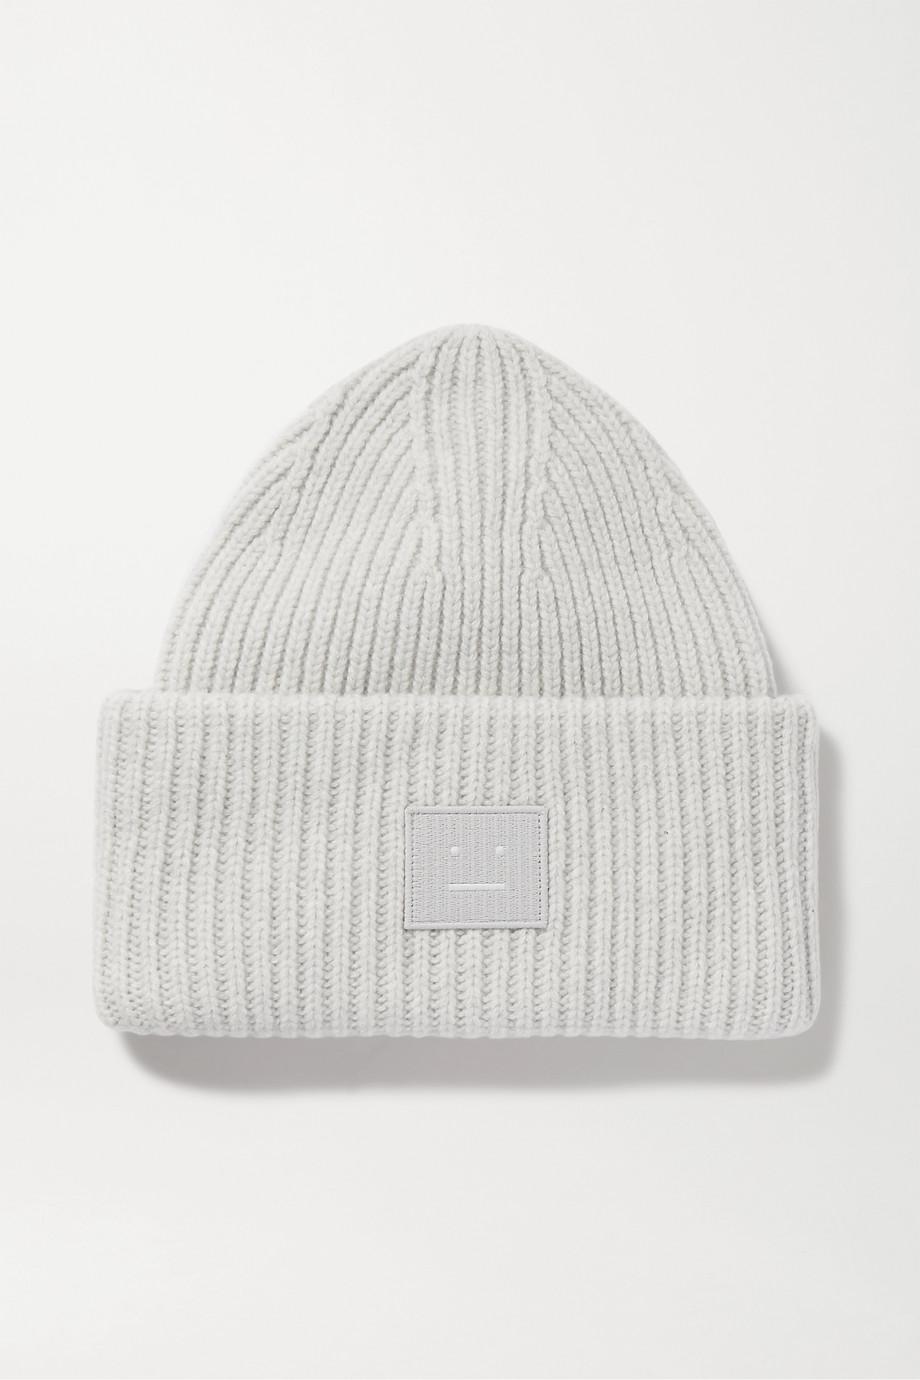 Acne Studios 贴花罗纹羊毛毛线帽